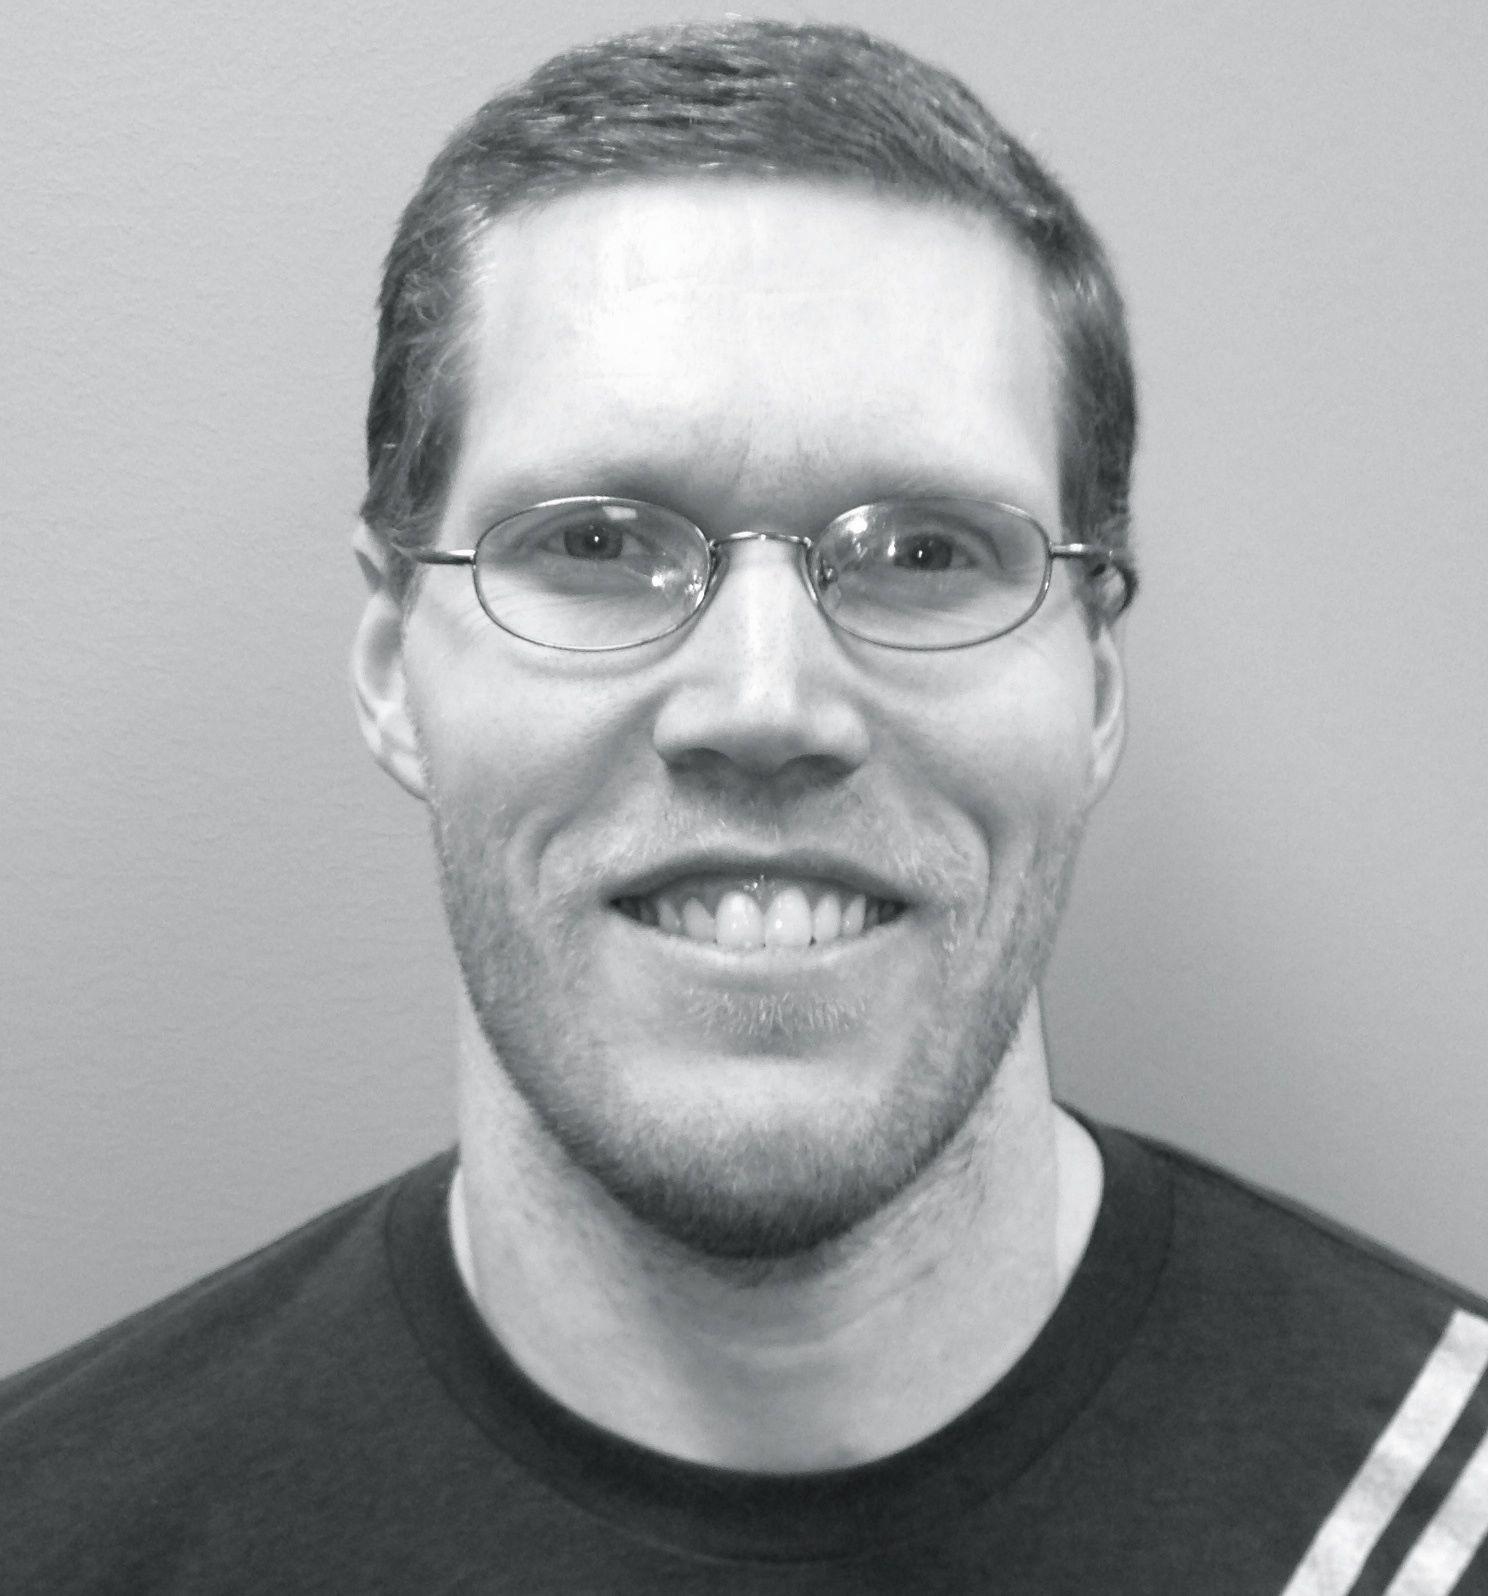 The Team: John Sandberg